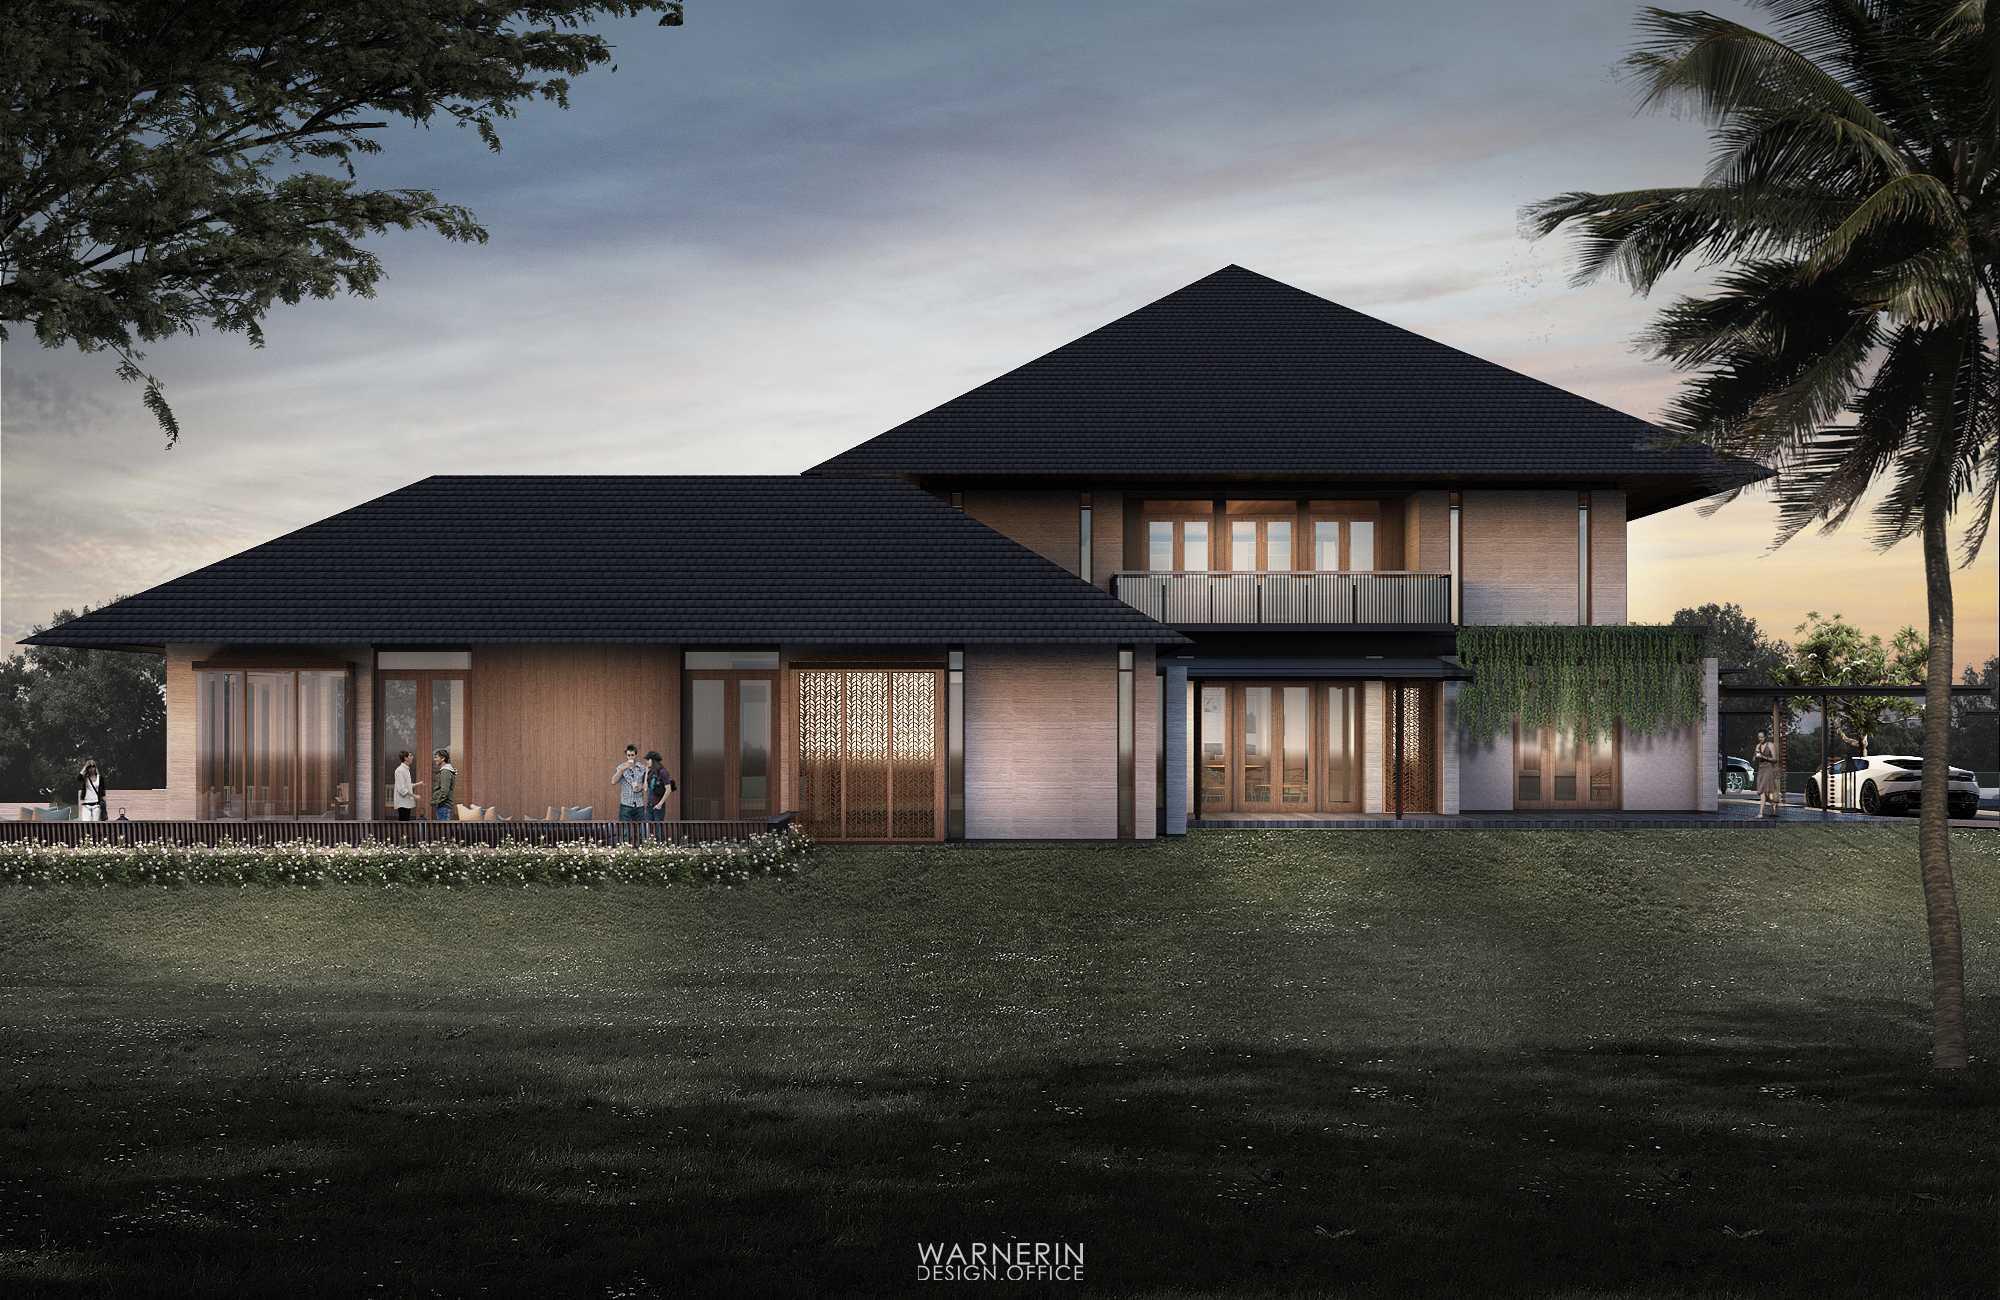 Warnerin Design Office Villa At Java Bandung, Bandung City, West Java, Indonesia  V02C-Wdo Modern,tropis  35550